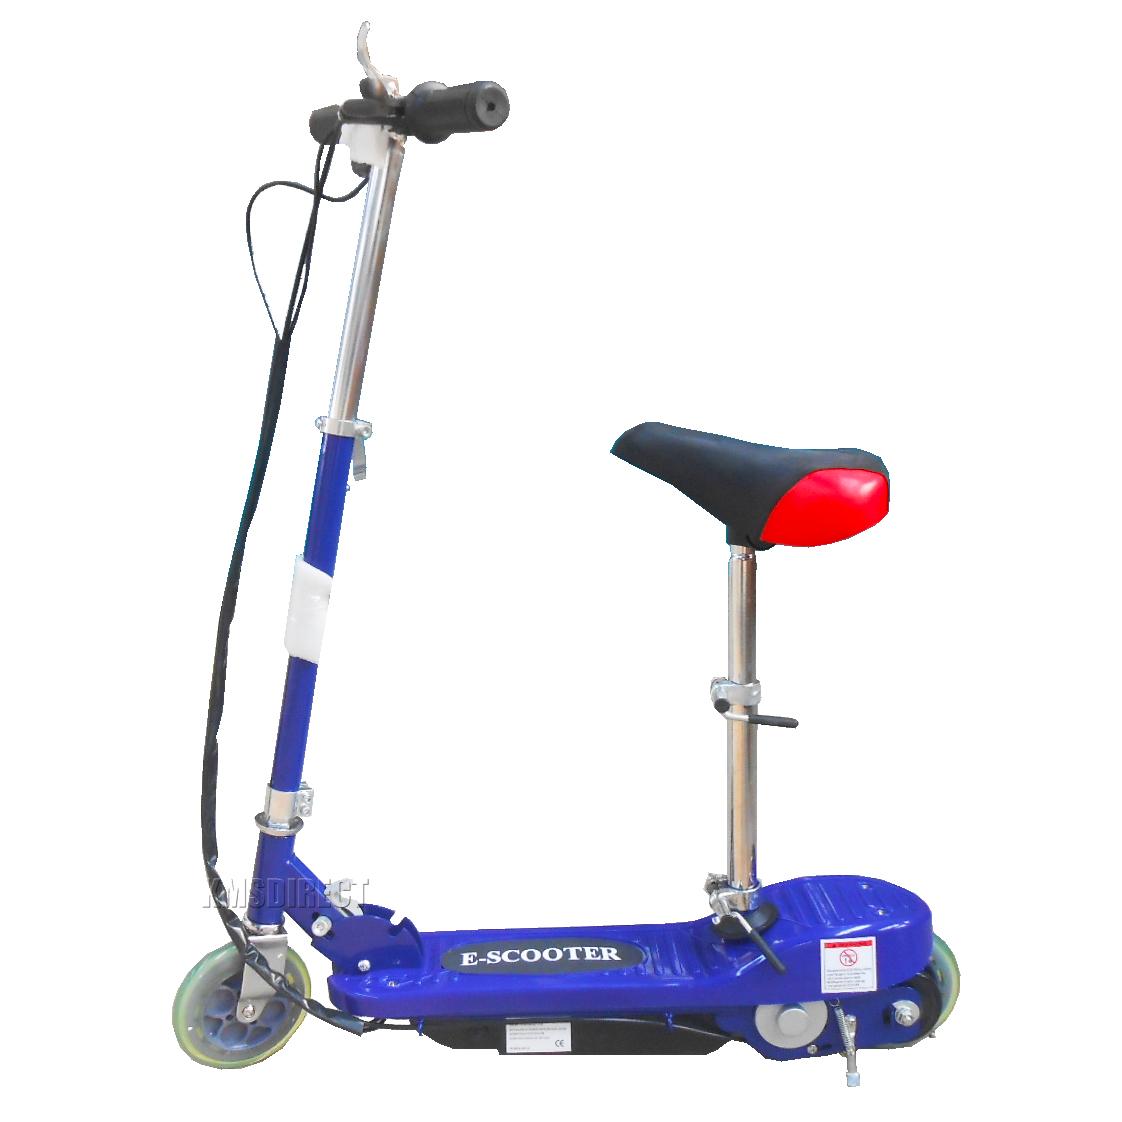 kids electric e scooter scooter ride on battery blue ebay. Black Bedroom Furniture Sets. Home Design Ideas